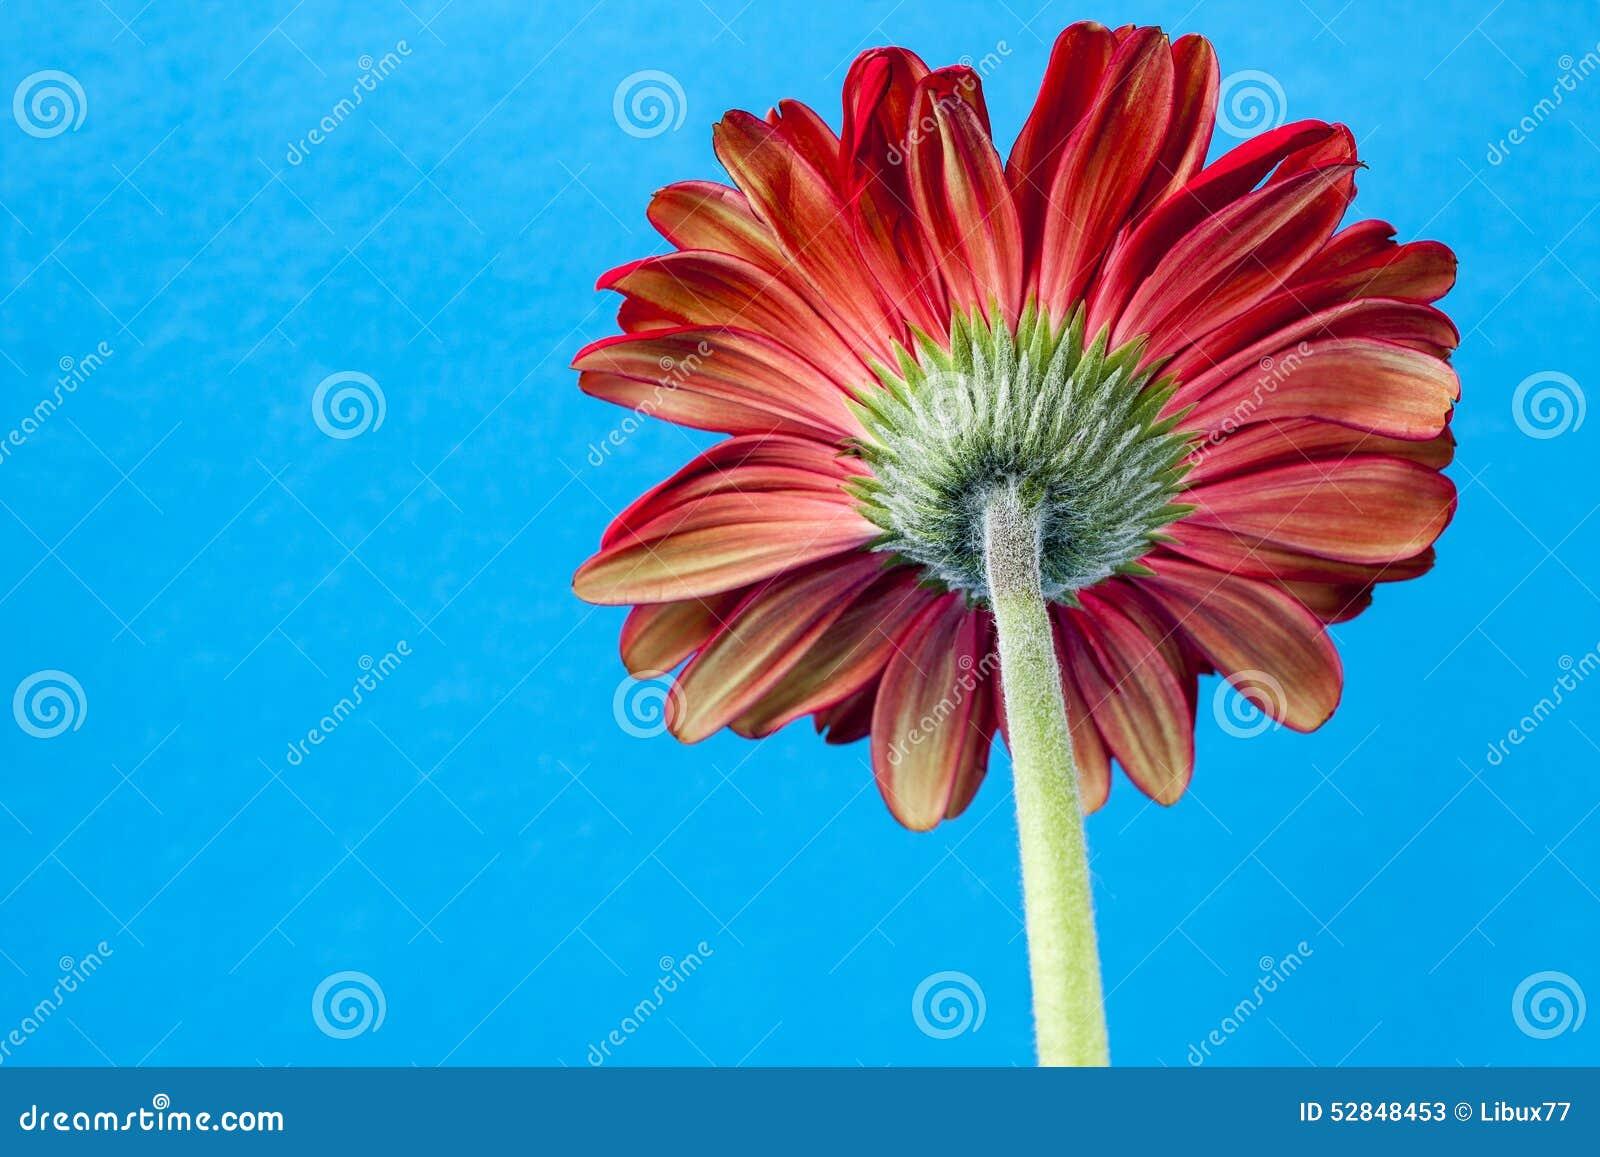 Back Gerbera Daisy Flower stock image. Image of detail - 52848453